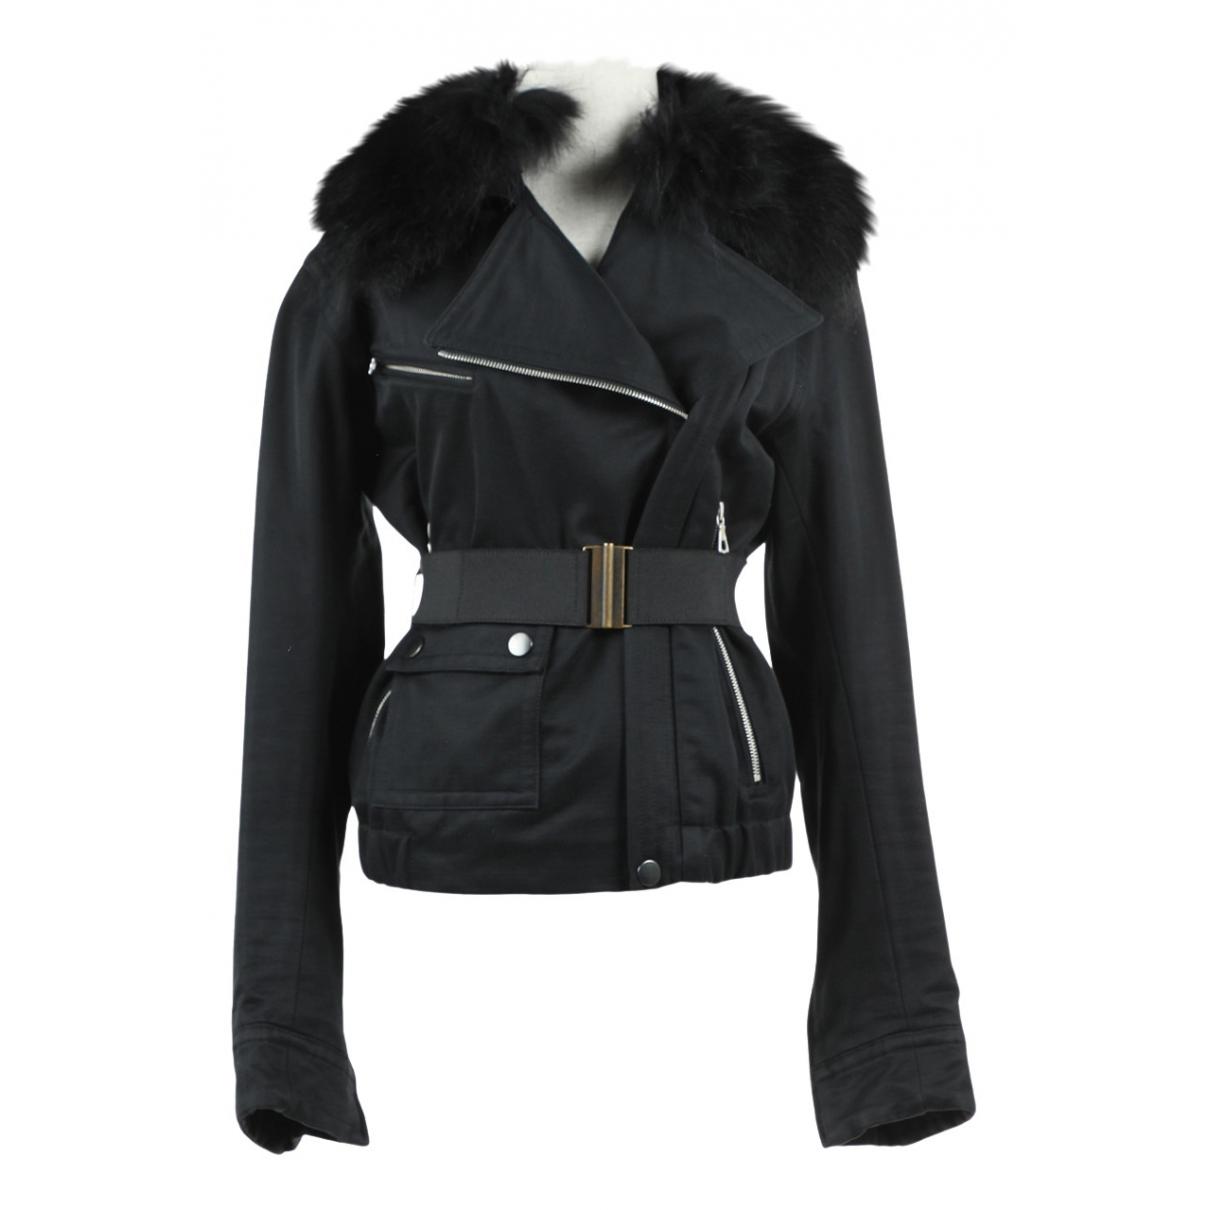 Dries Van Noten \N Black Cotton jacket for Women S International